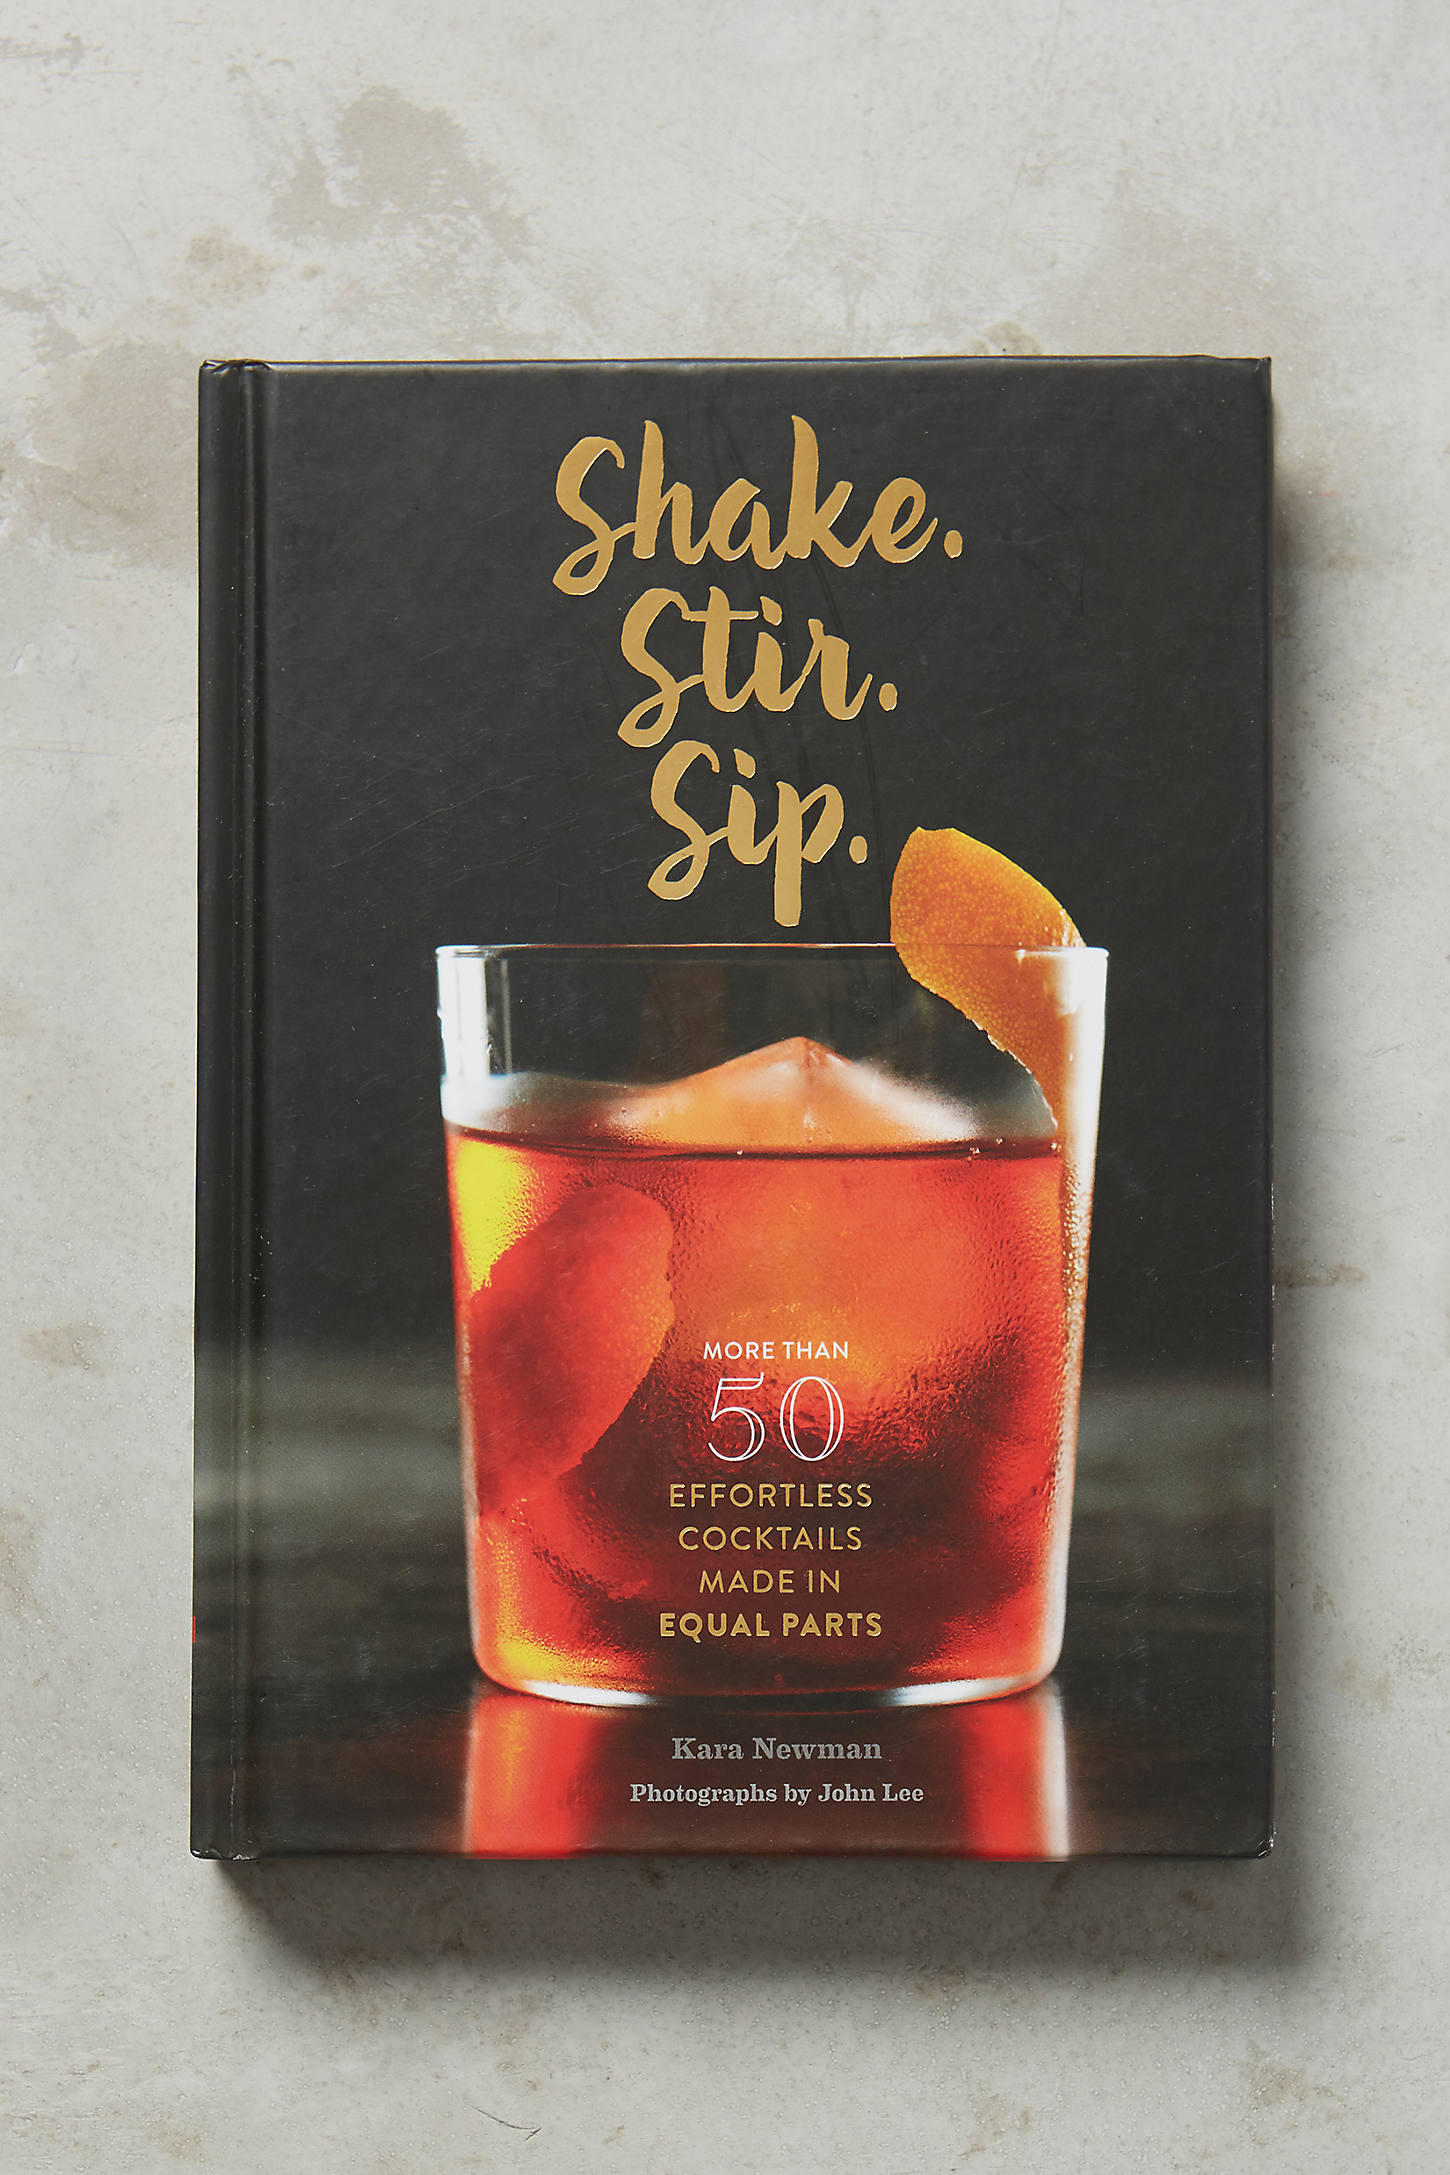 Shake. Stir. Sip.